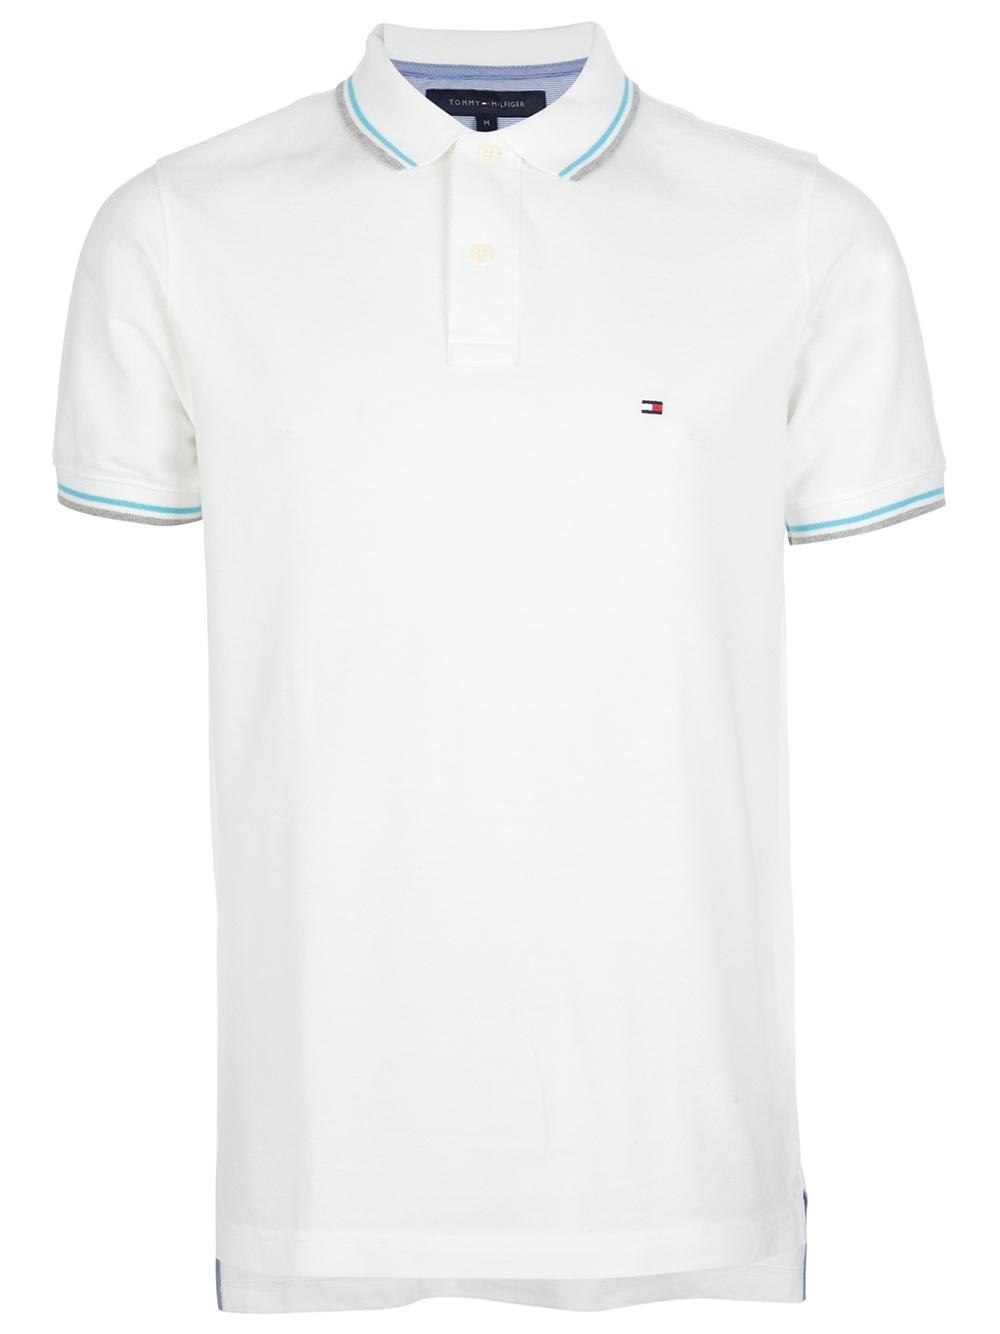 tommy hilfiger contrast trim polo shirt in white for men. Black Bedroom Furniture Sets. Home Design Ideas